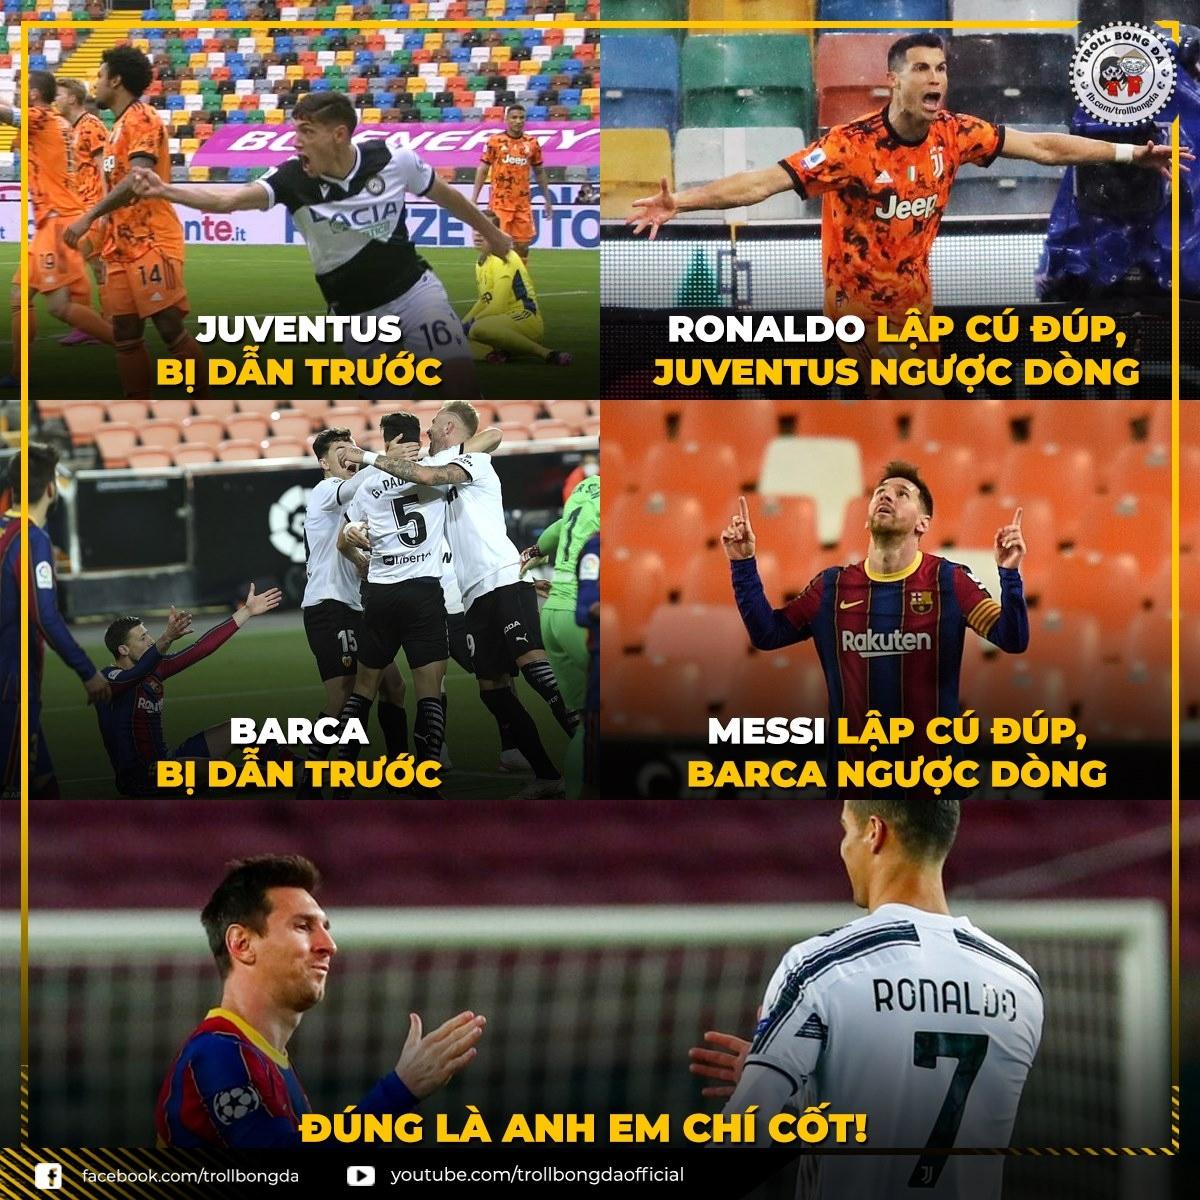 Cristiano Ronaldo gọi, Lionel Messi trả lời. (Ảnh: Troll Bóng Đá)